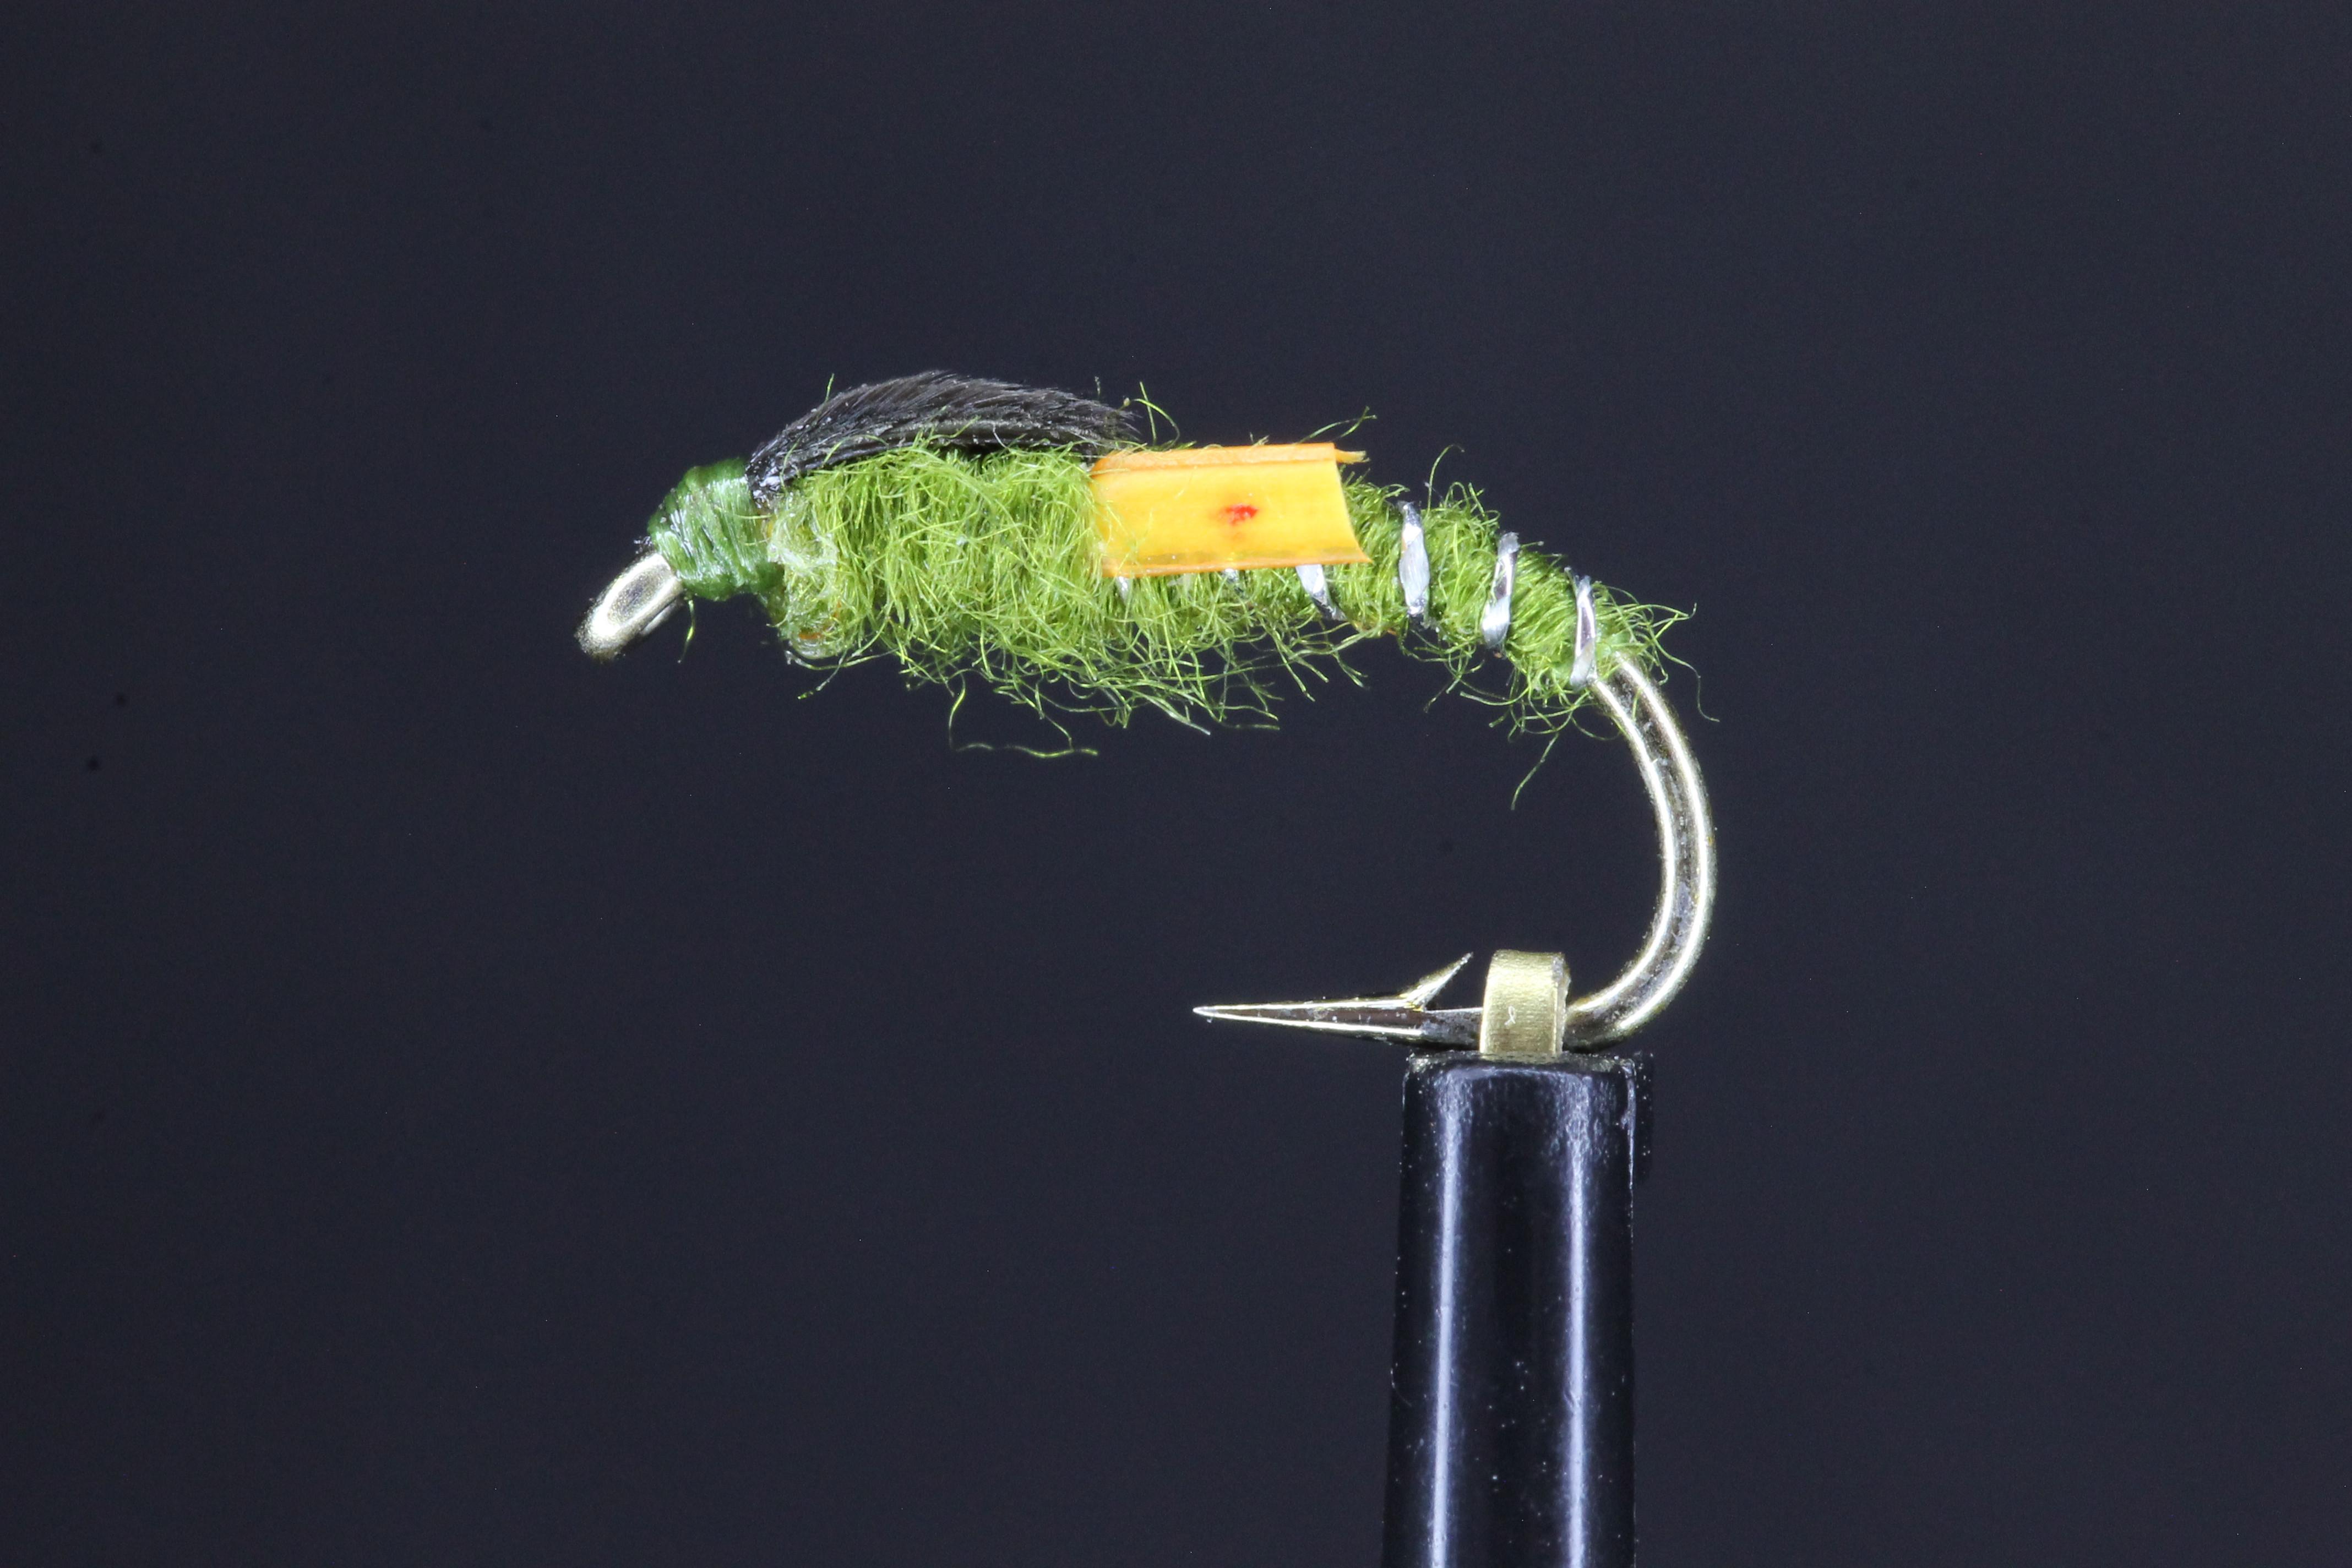 Olive Biot Buzzer